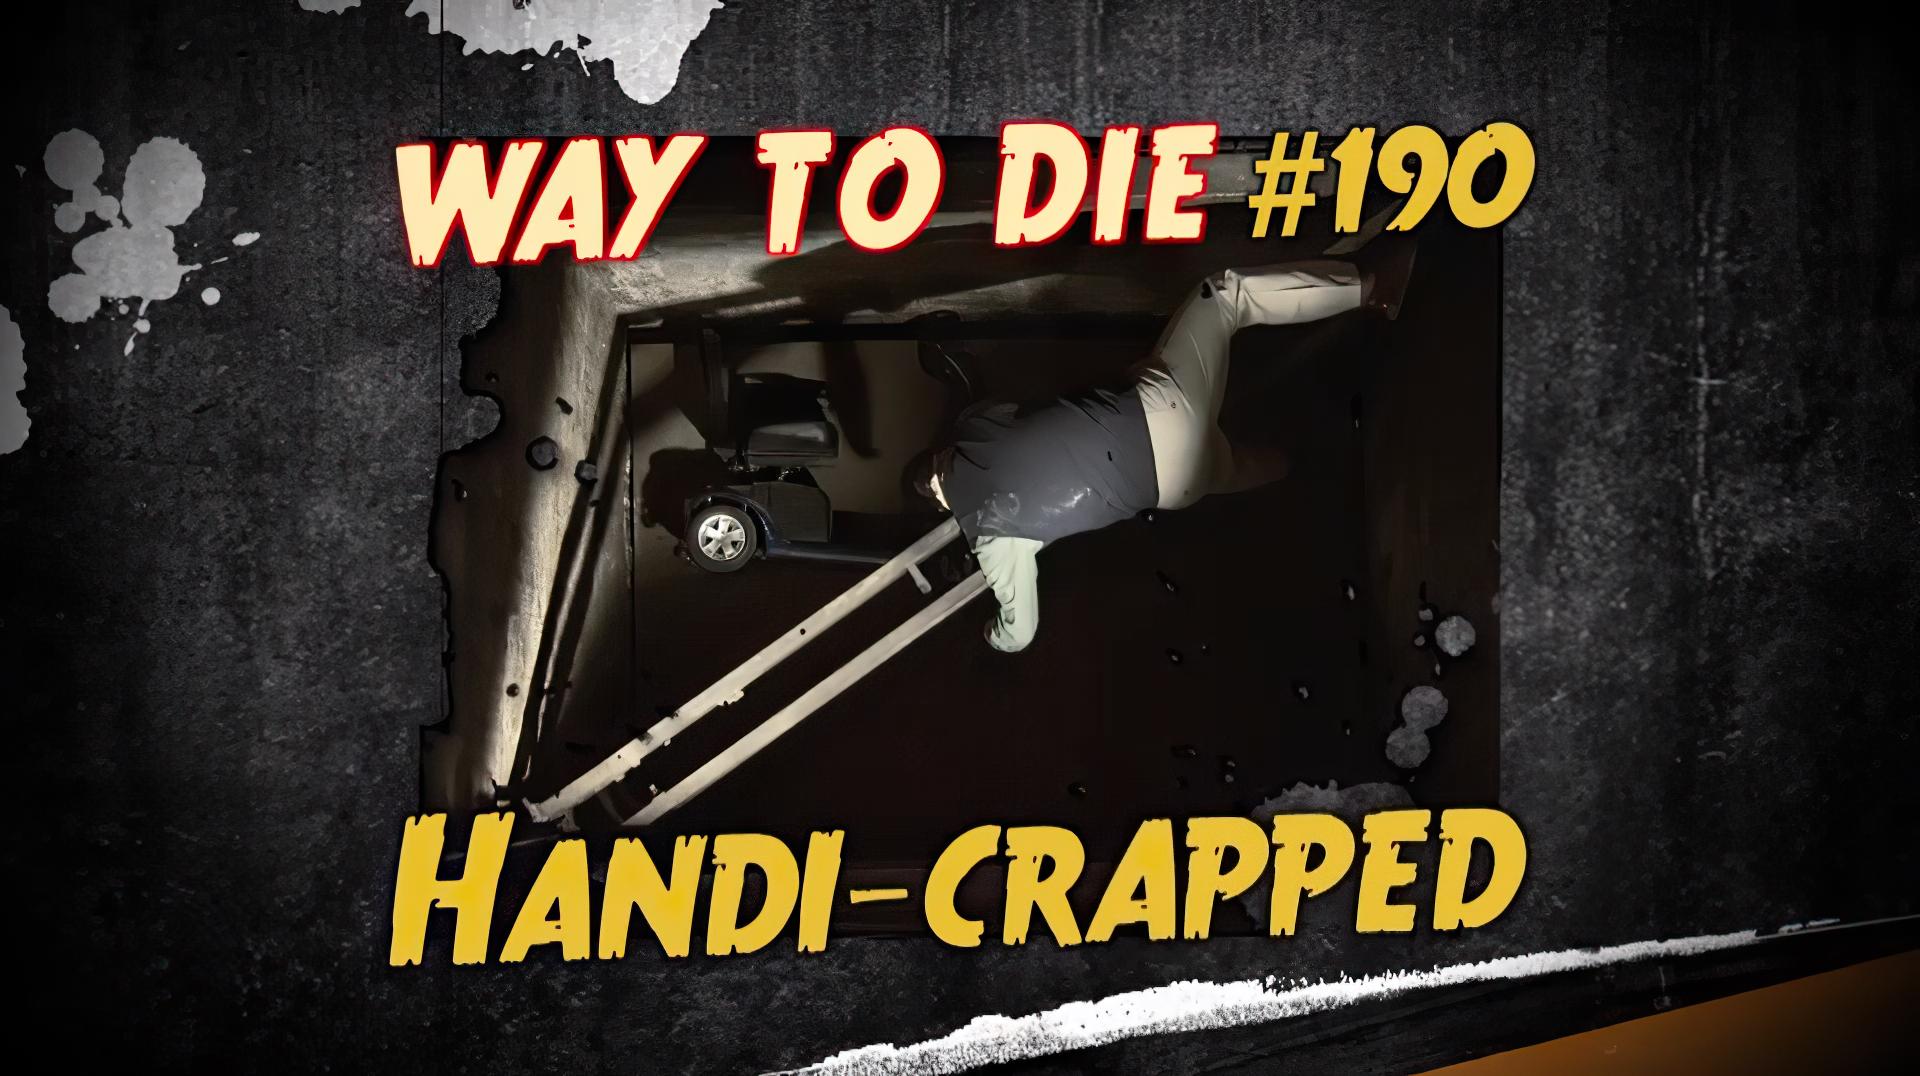 Handi-Crapped (190)